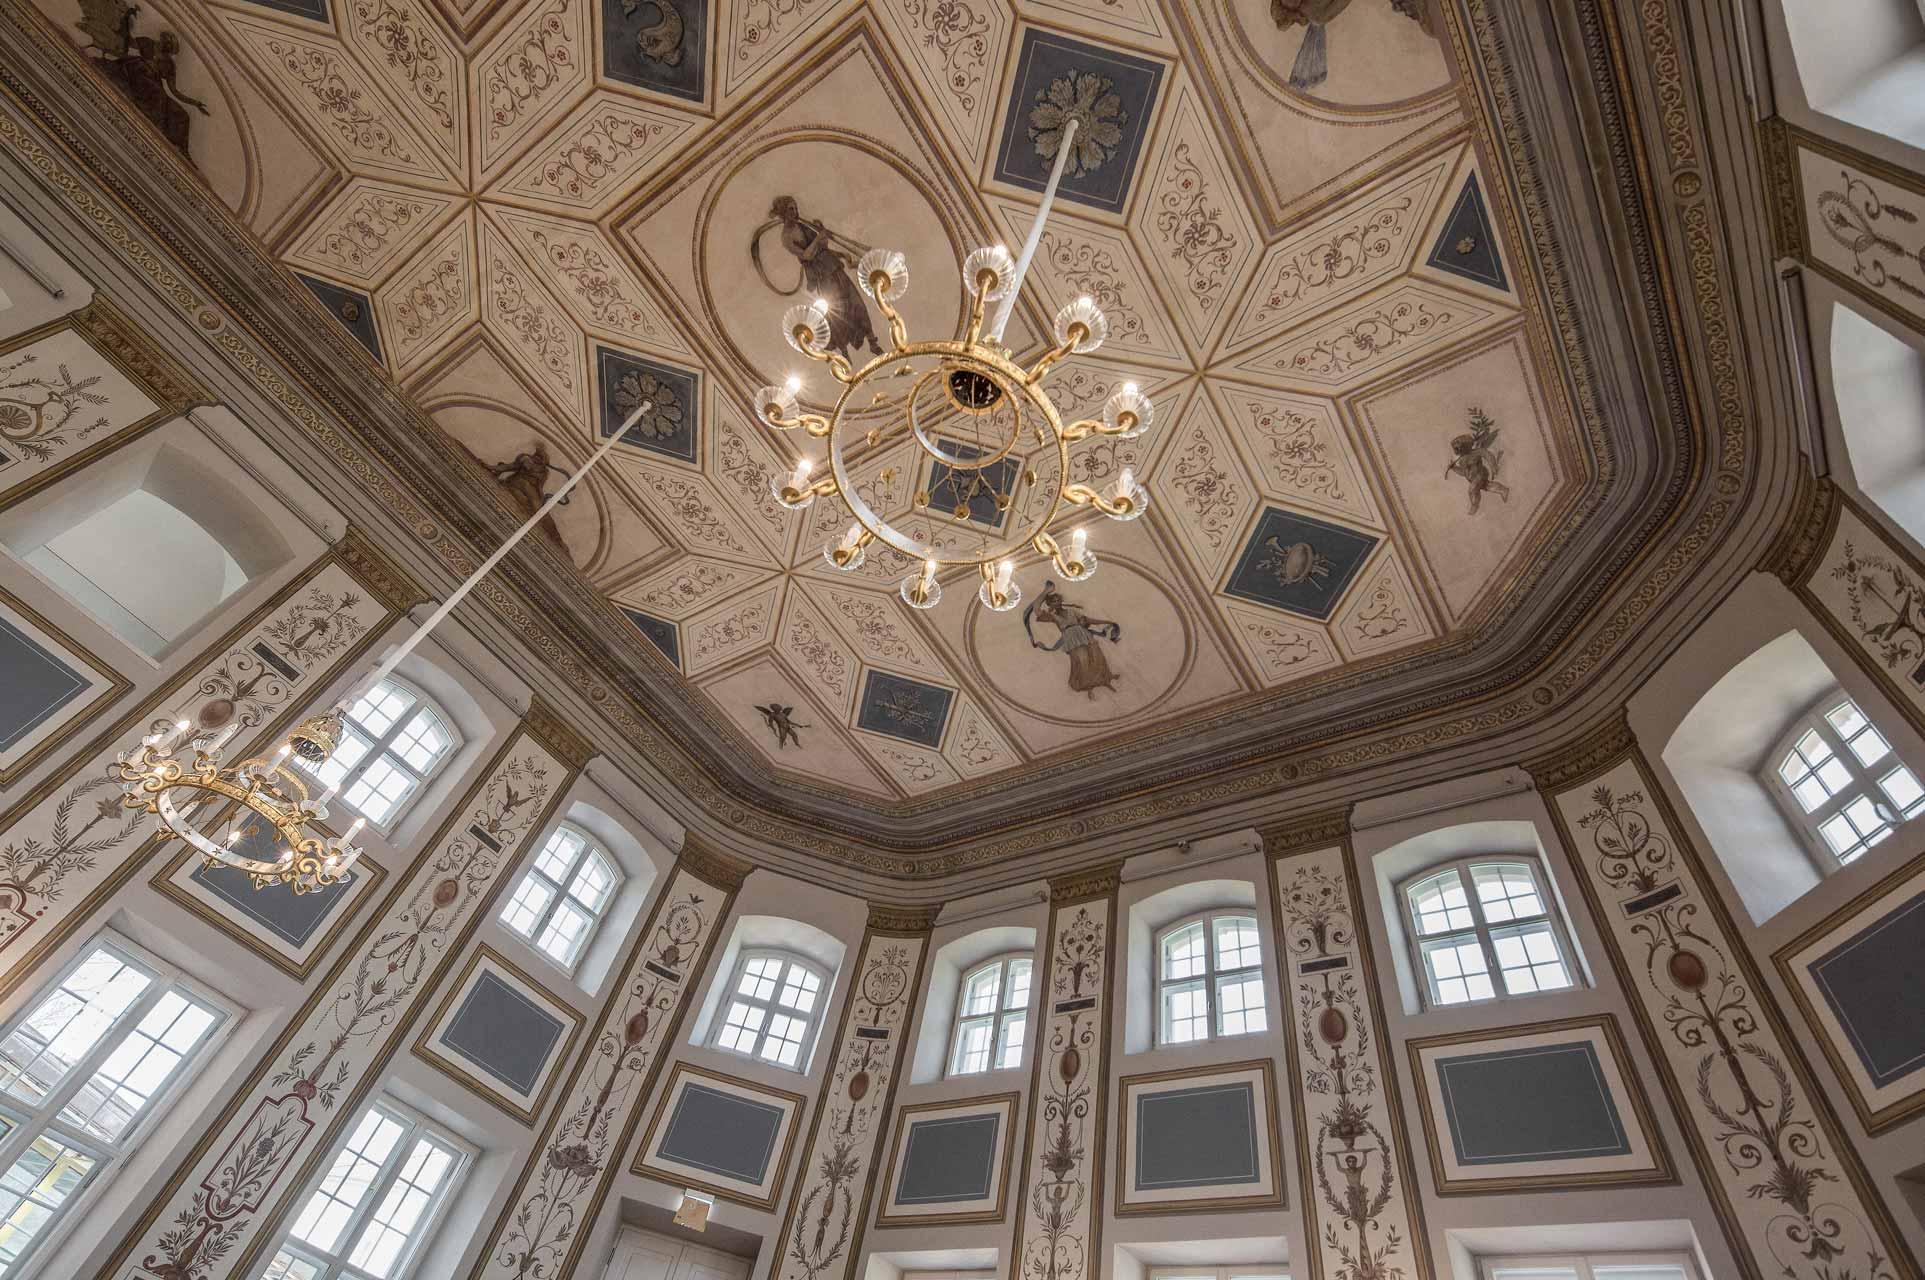 Historischer Kursaal – Historische Kuranlagen & Goethe-Theater Bad Lauchstädt GmbH